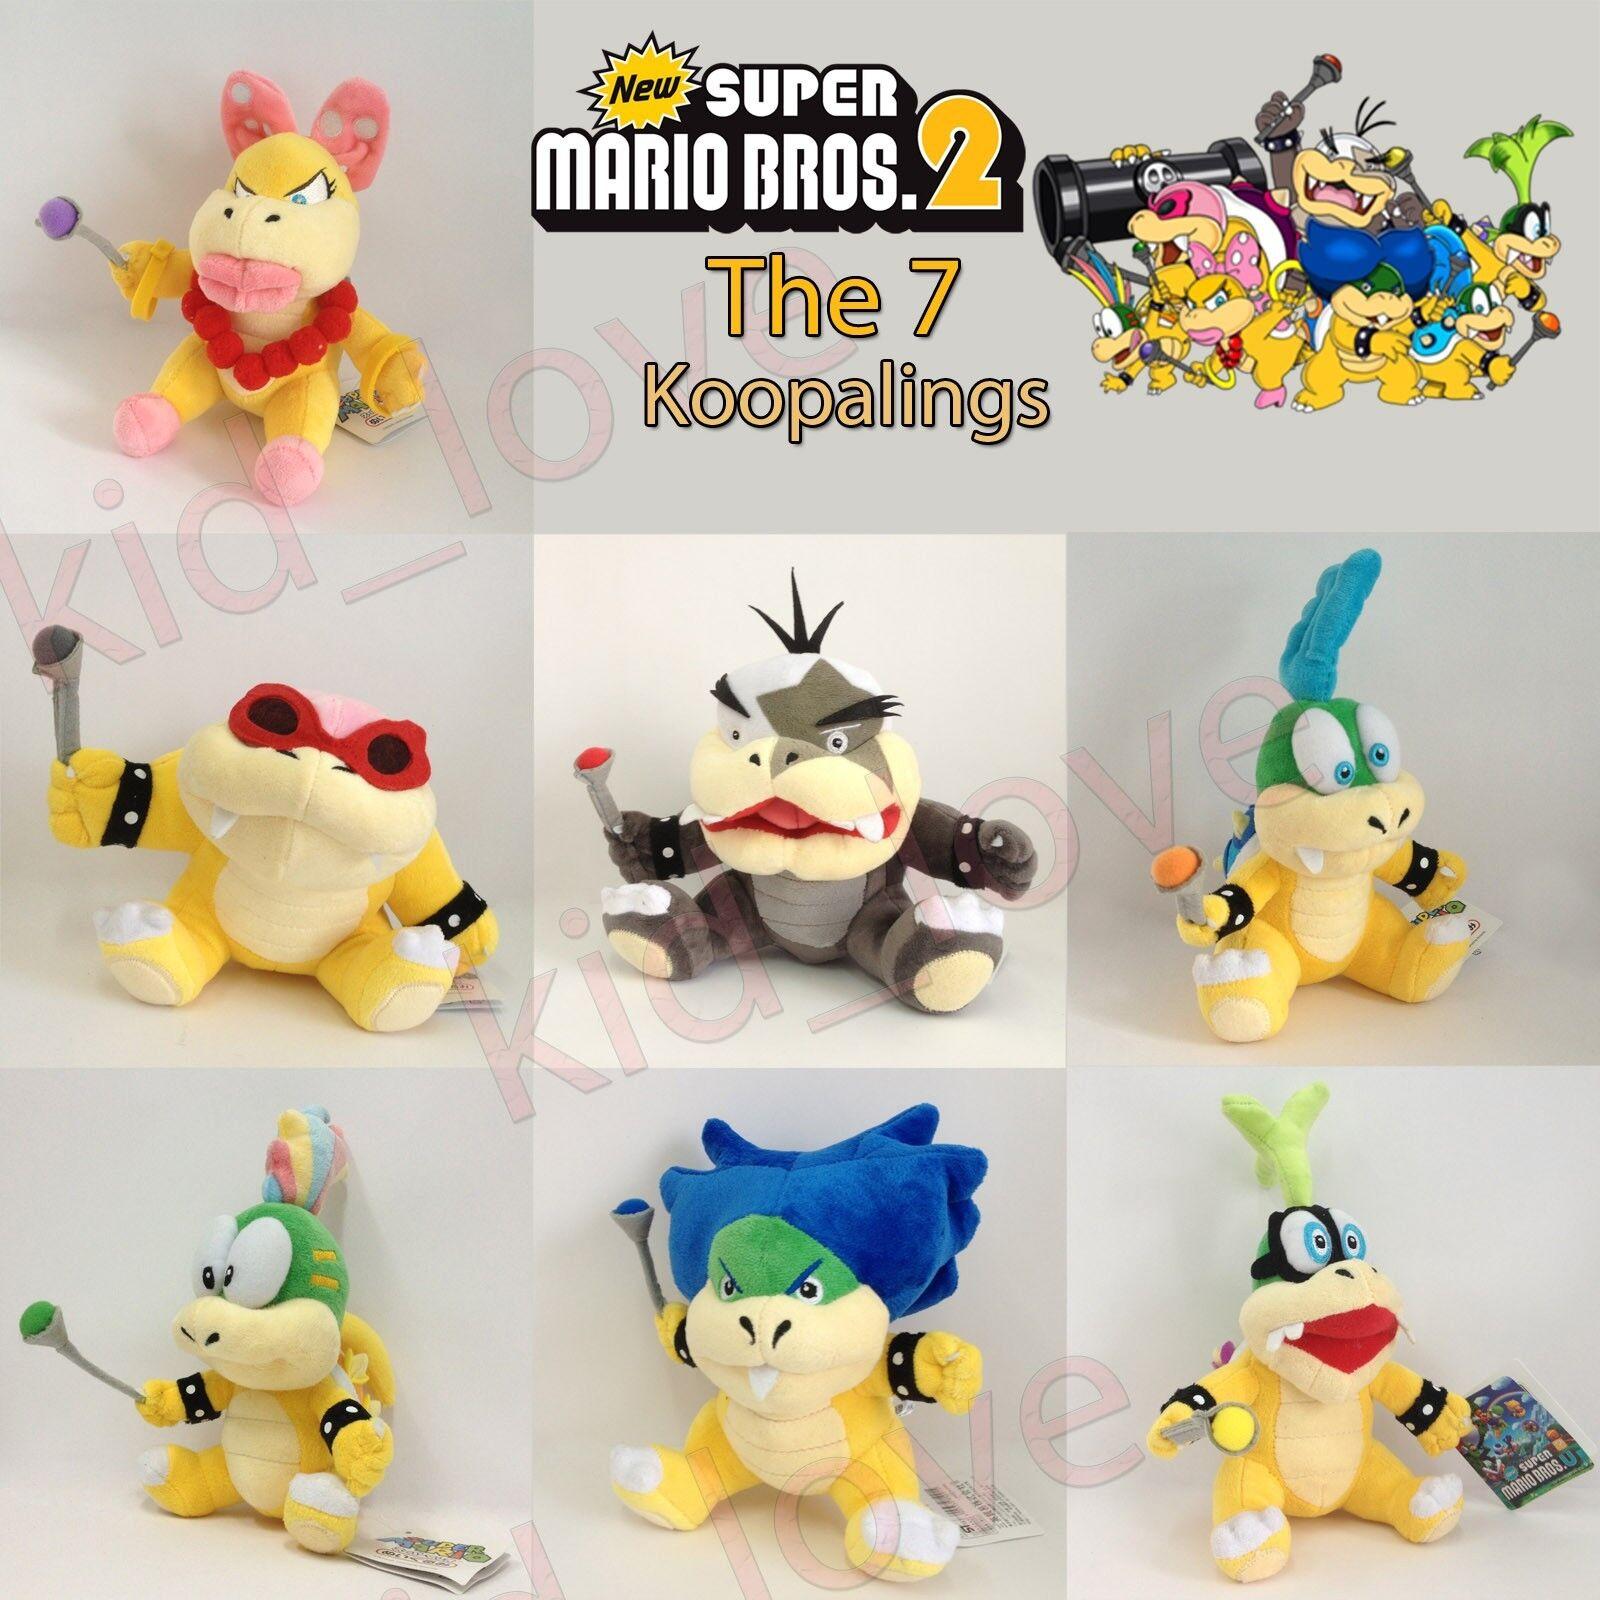 7X Ny Super Mario Bros Koopalings Minions Plush mjuk leksak Stuffing djur Doll 6